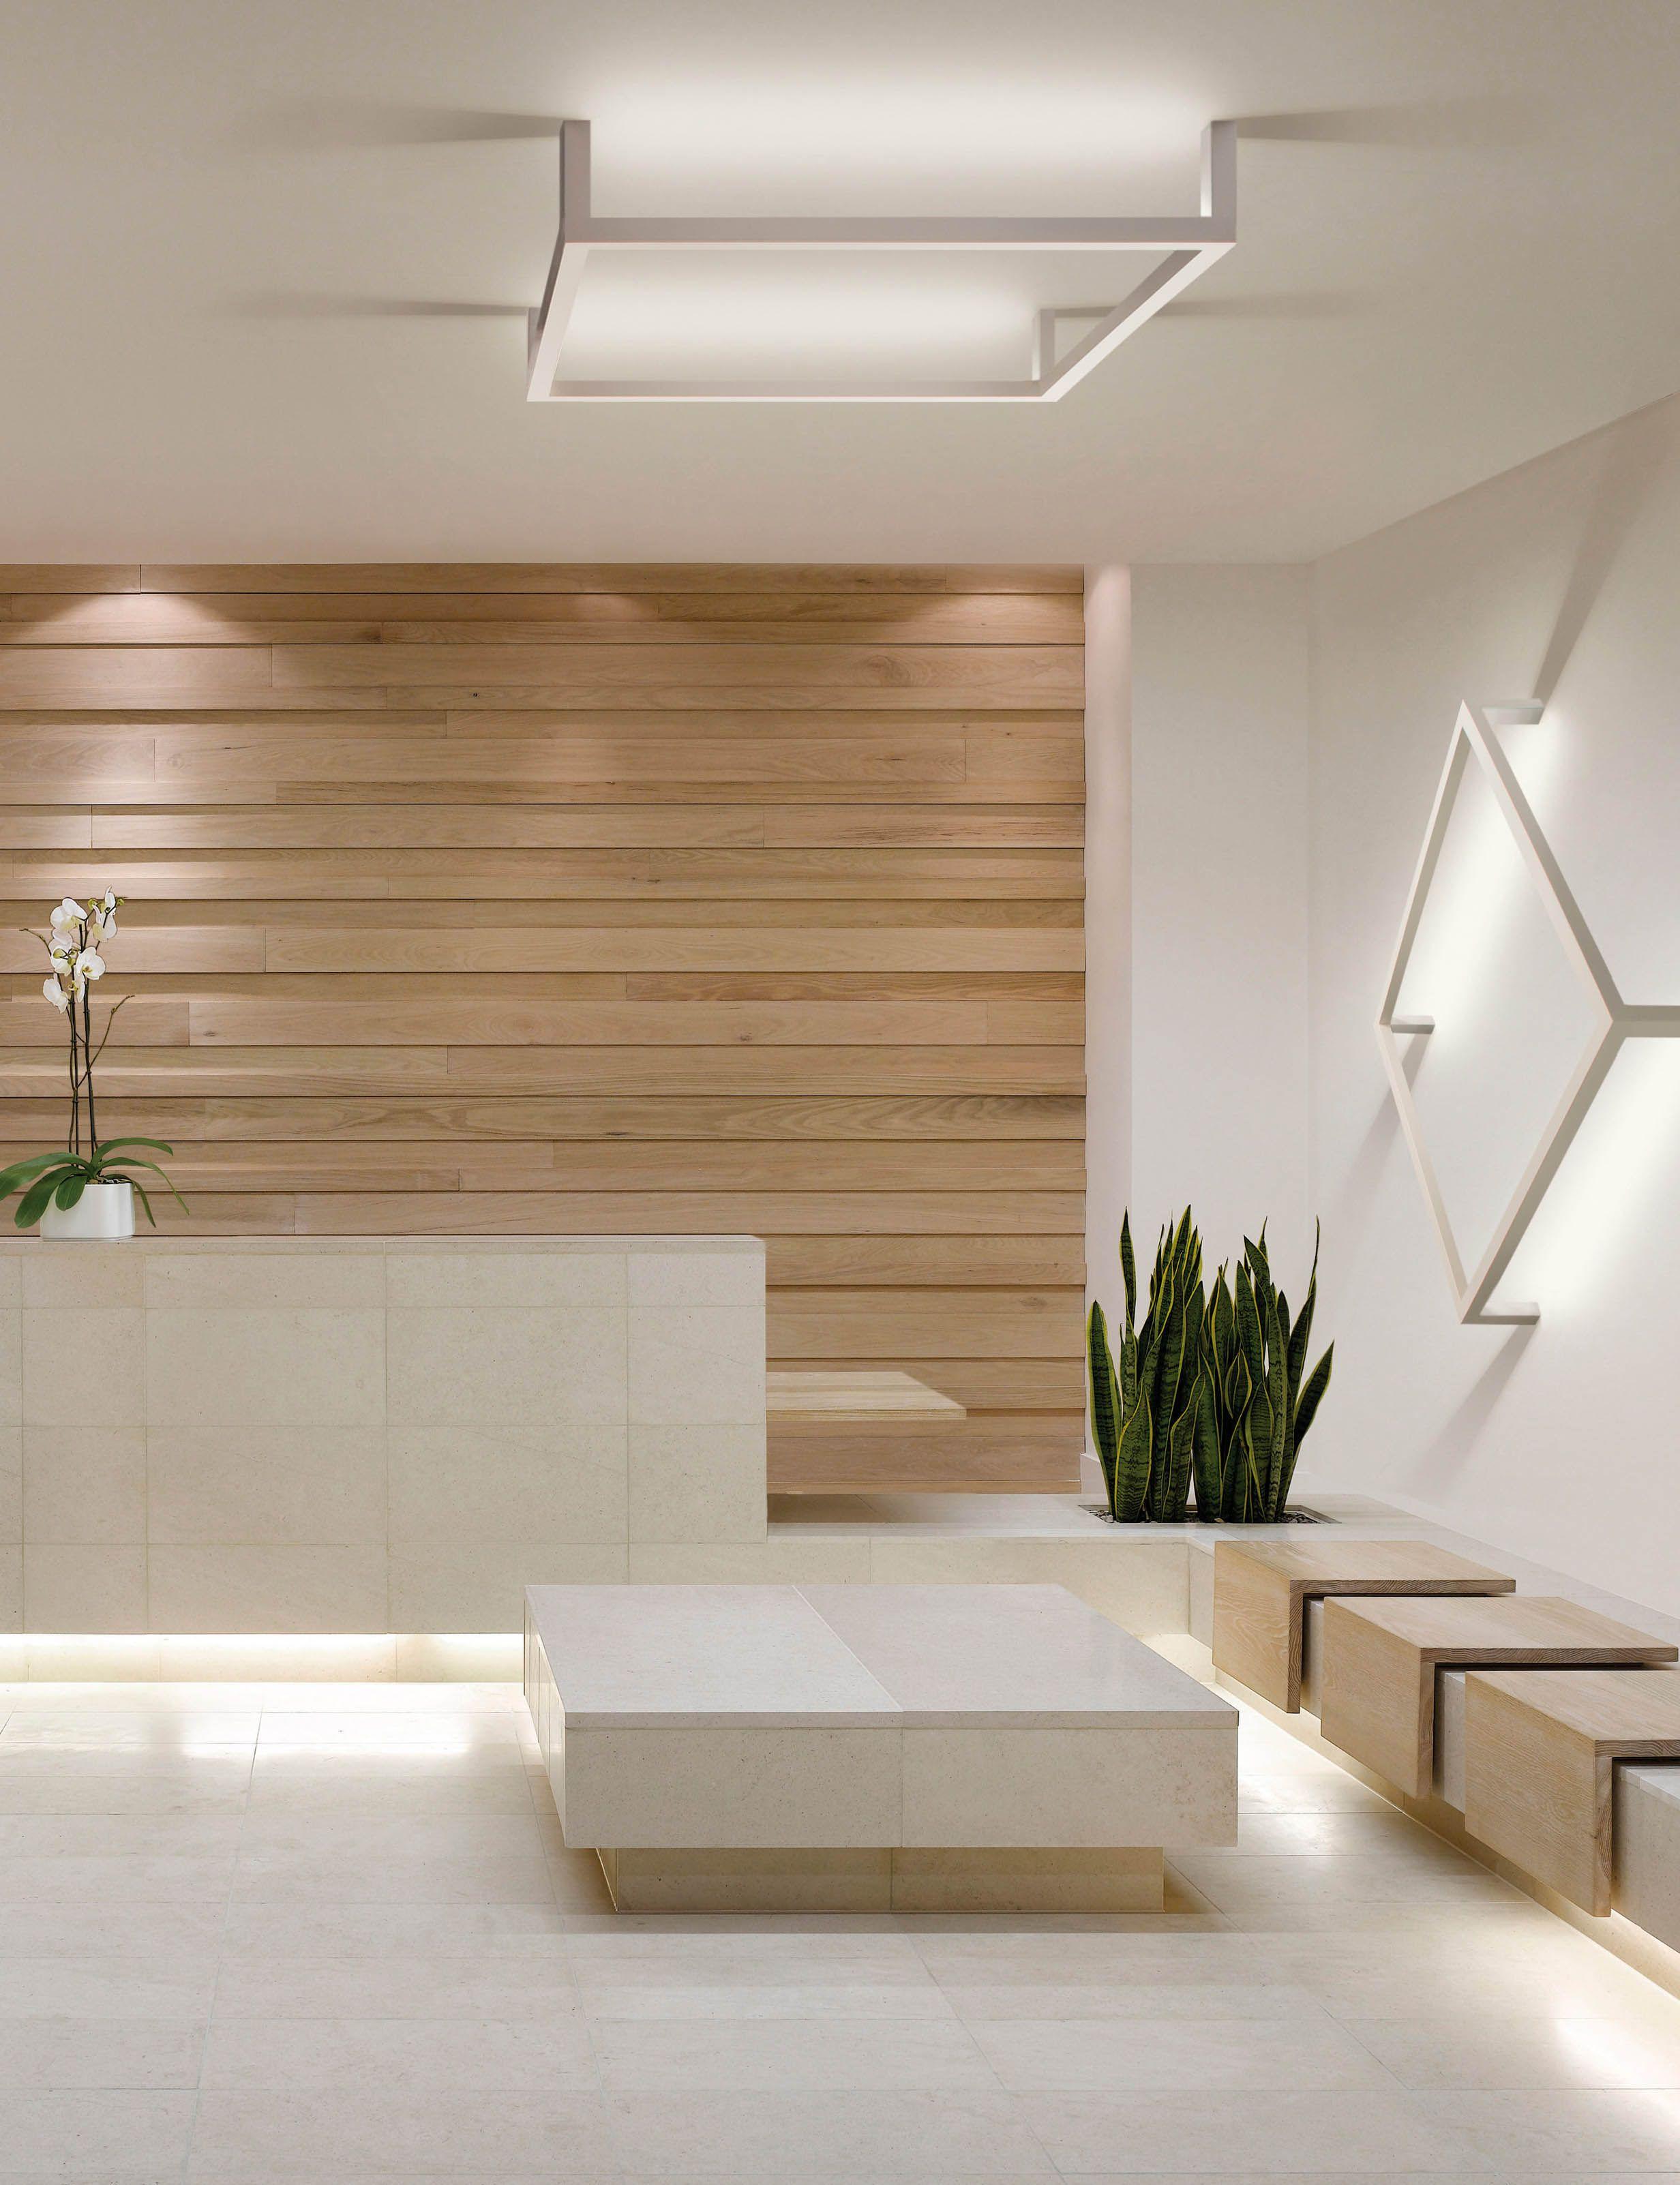 cool inspiration wood interior walls. wall behind reception desk Framework by Manuel Vivian  sleek clean lines wood panels area AxoLight 1 bafco bafcointeriors Visit www com